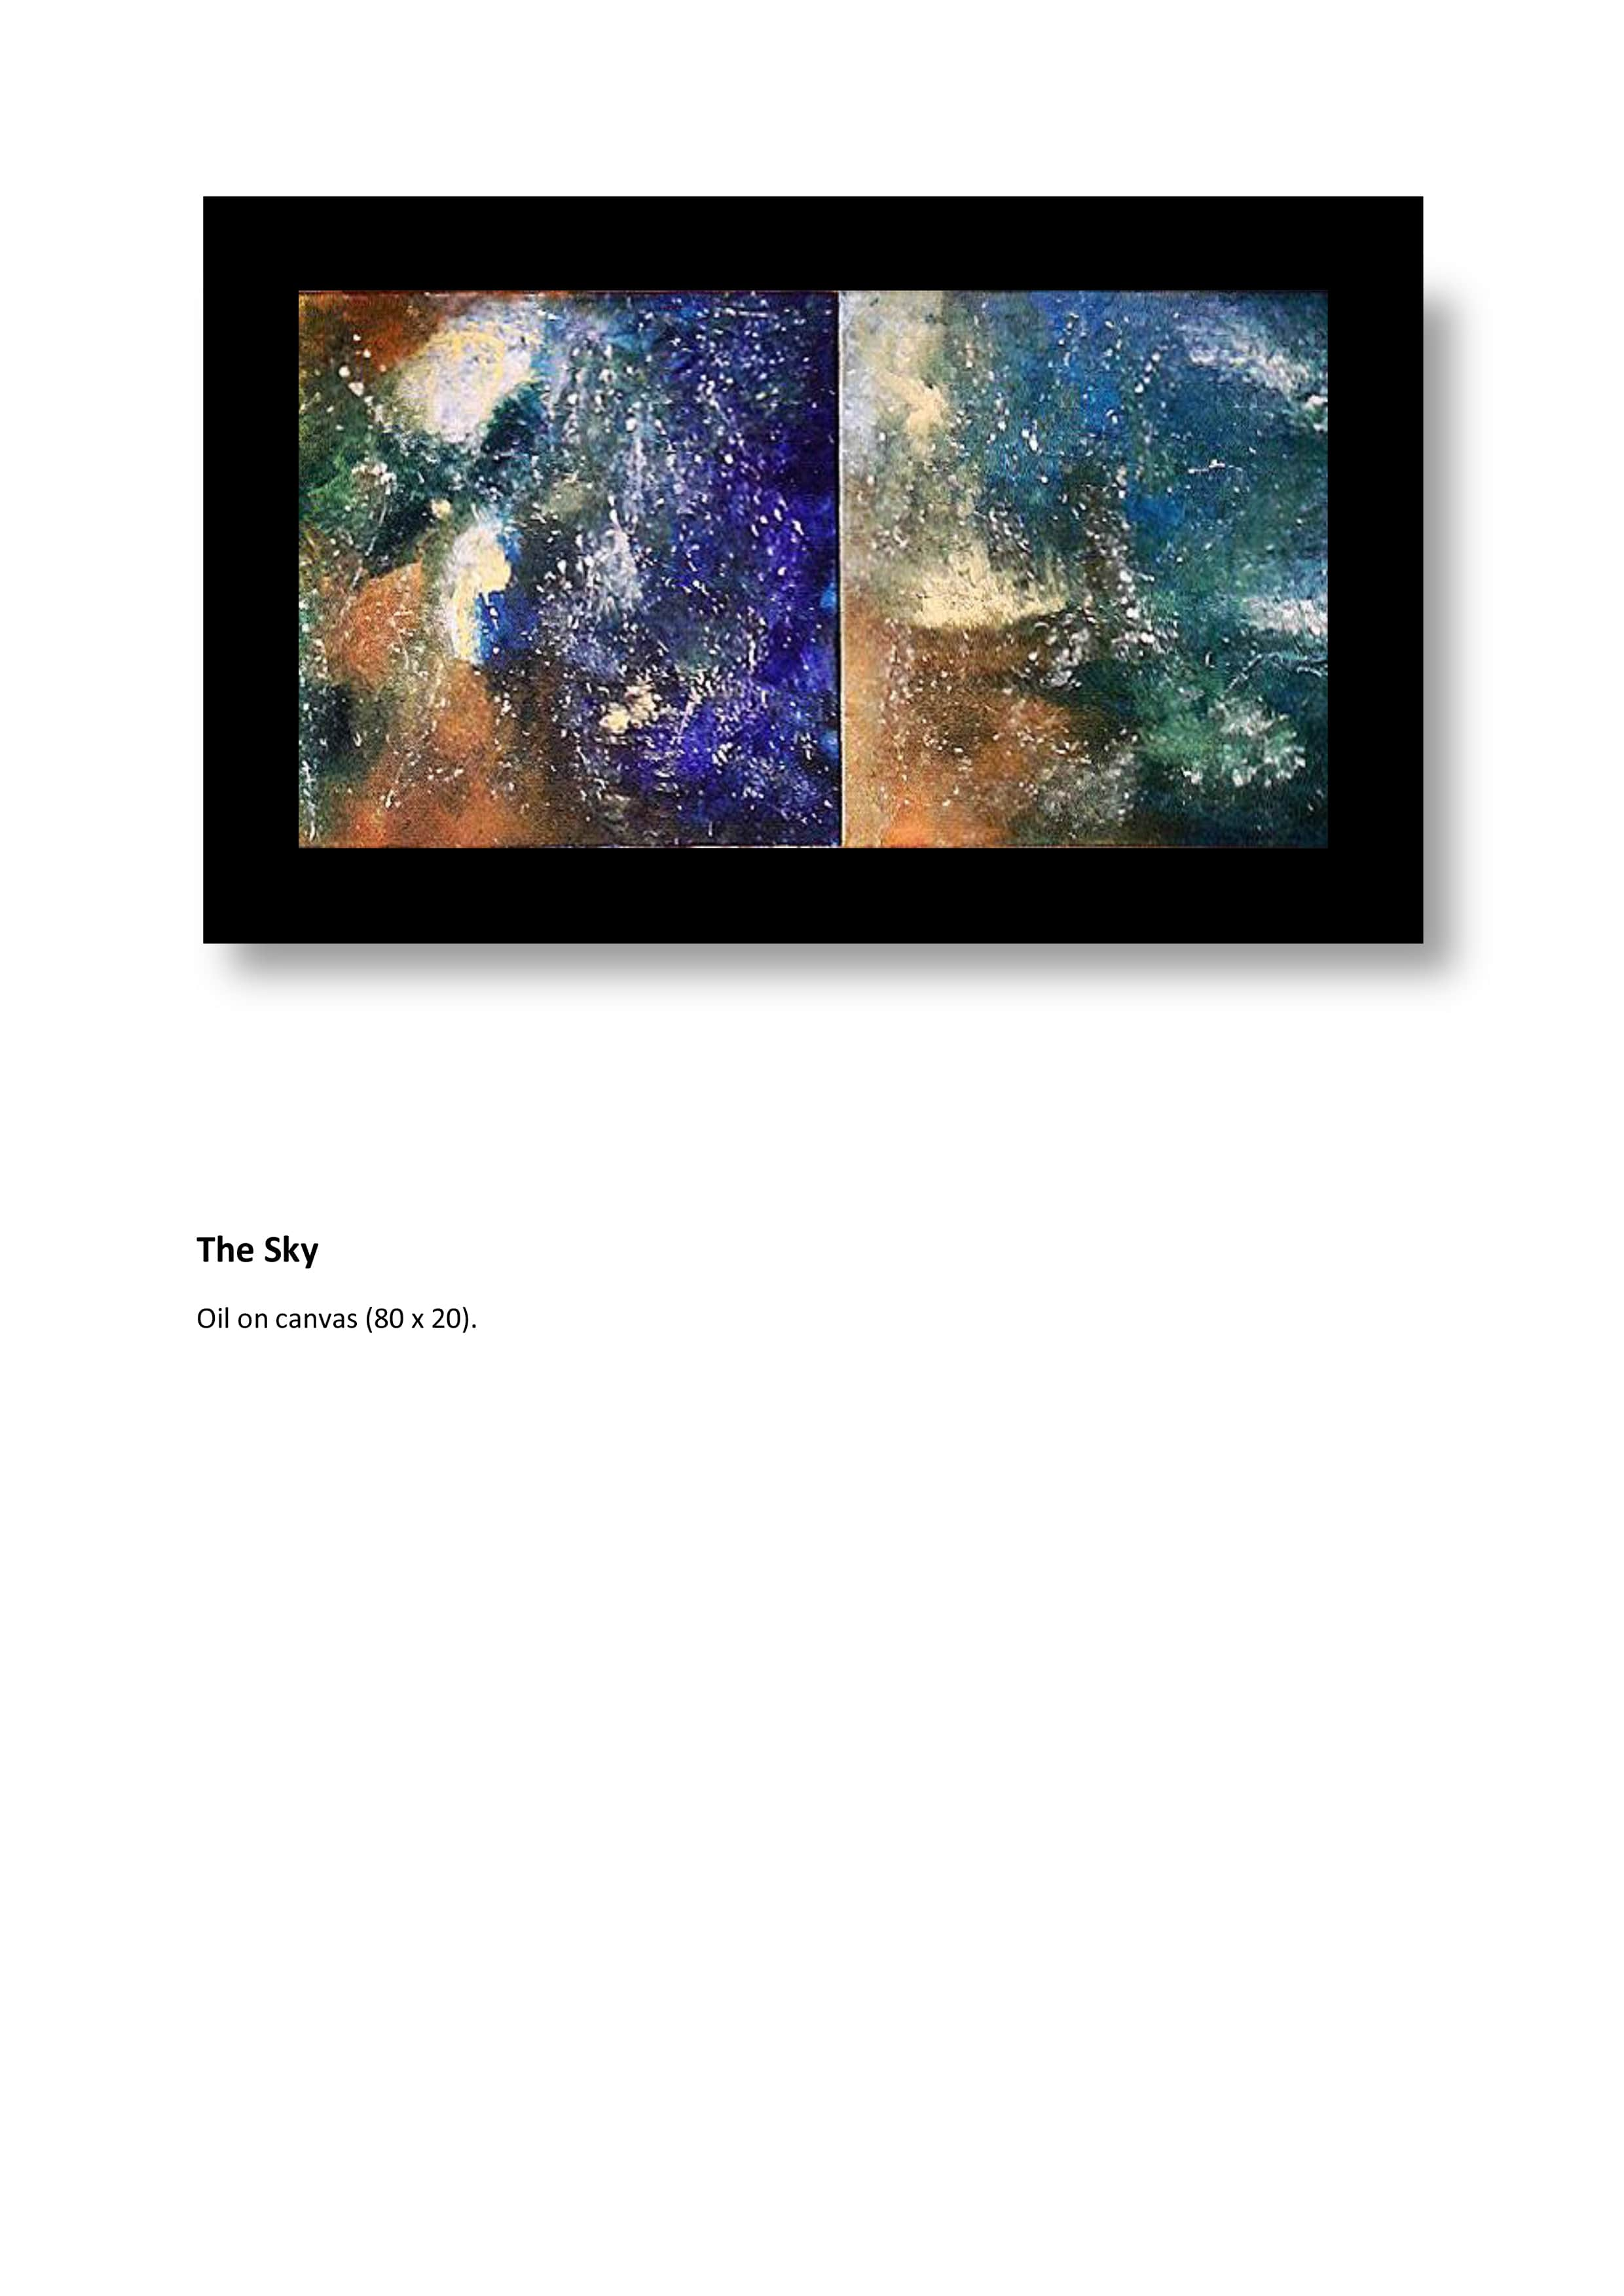 art-portfolio-aglae-corrected-21-min.jpg